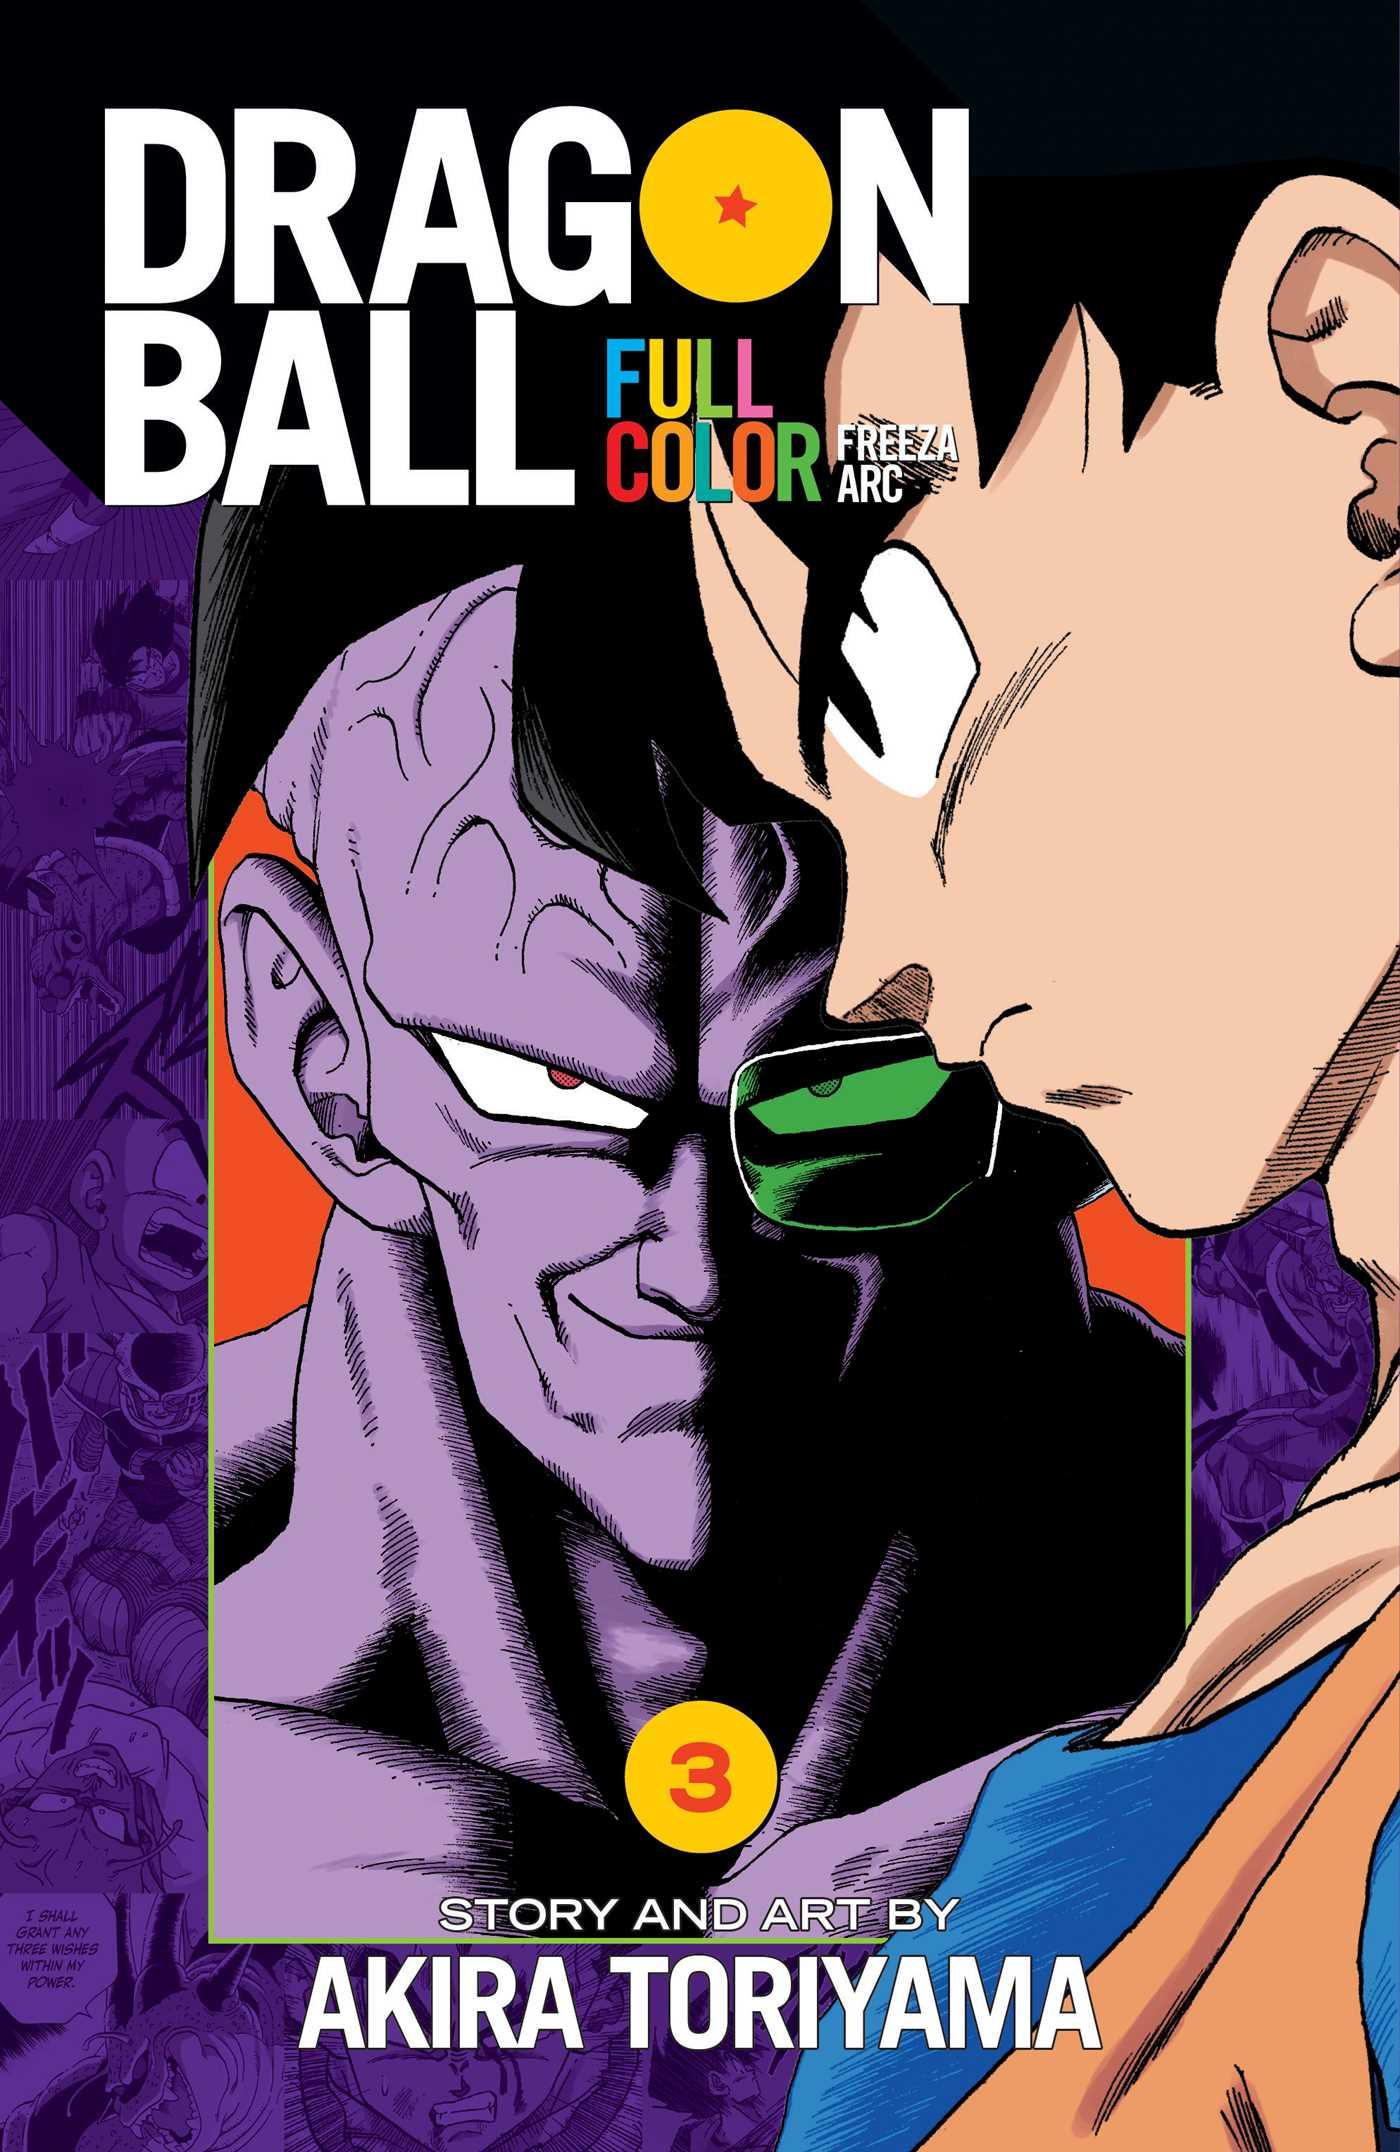 Dragon Ball Full Color Freeza Arc, Vol. 3   Book by Akira Toriyama ...